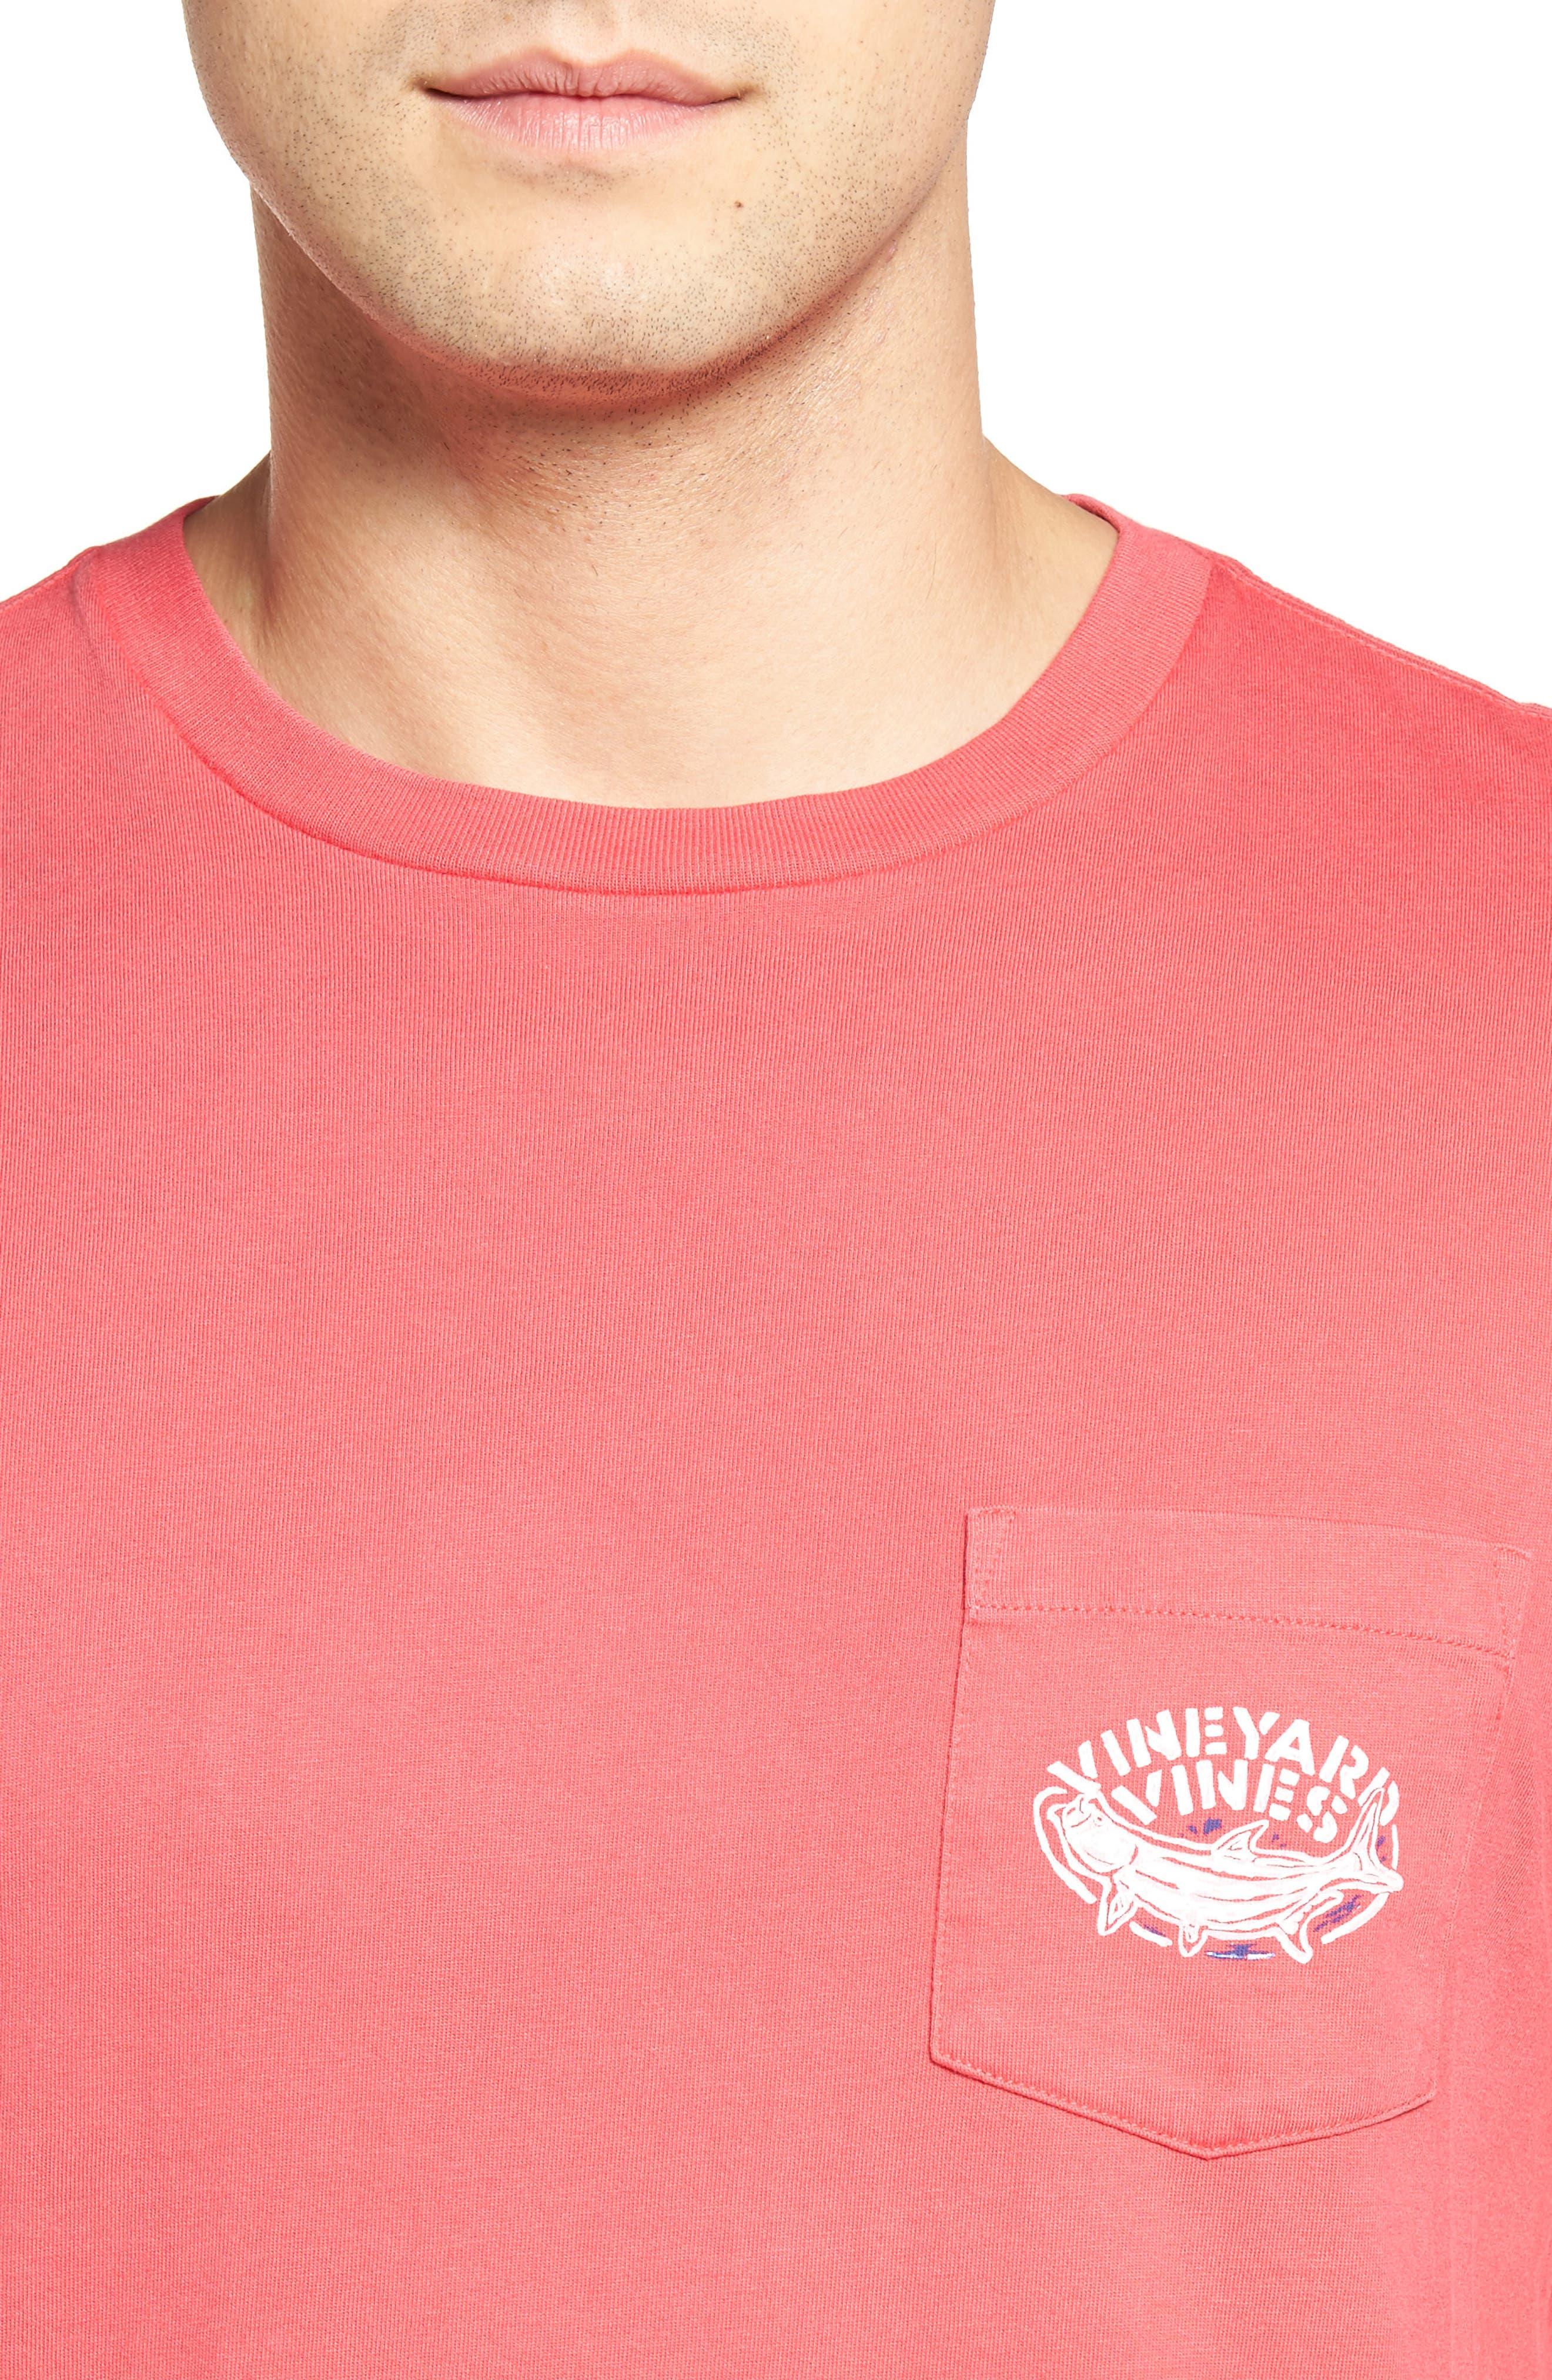 Alternate Image 4  - Vineyard Vines Stencil Tarpon Graphic Pocket T-Shirt